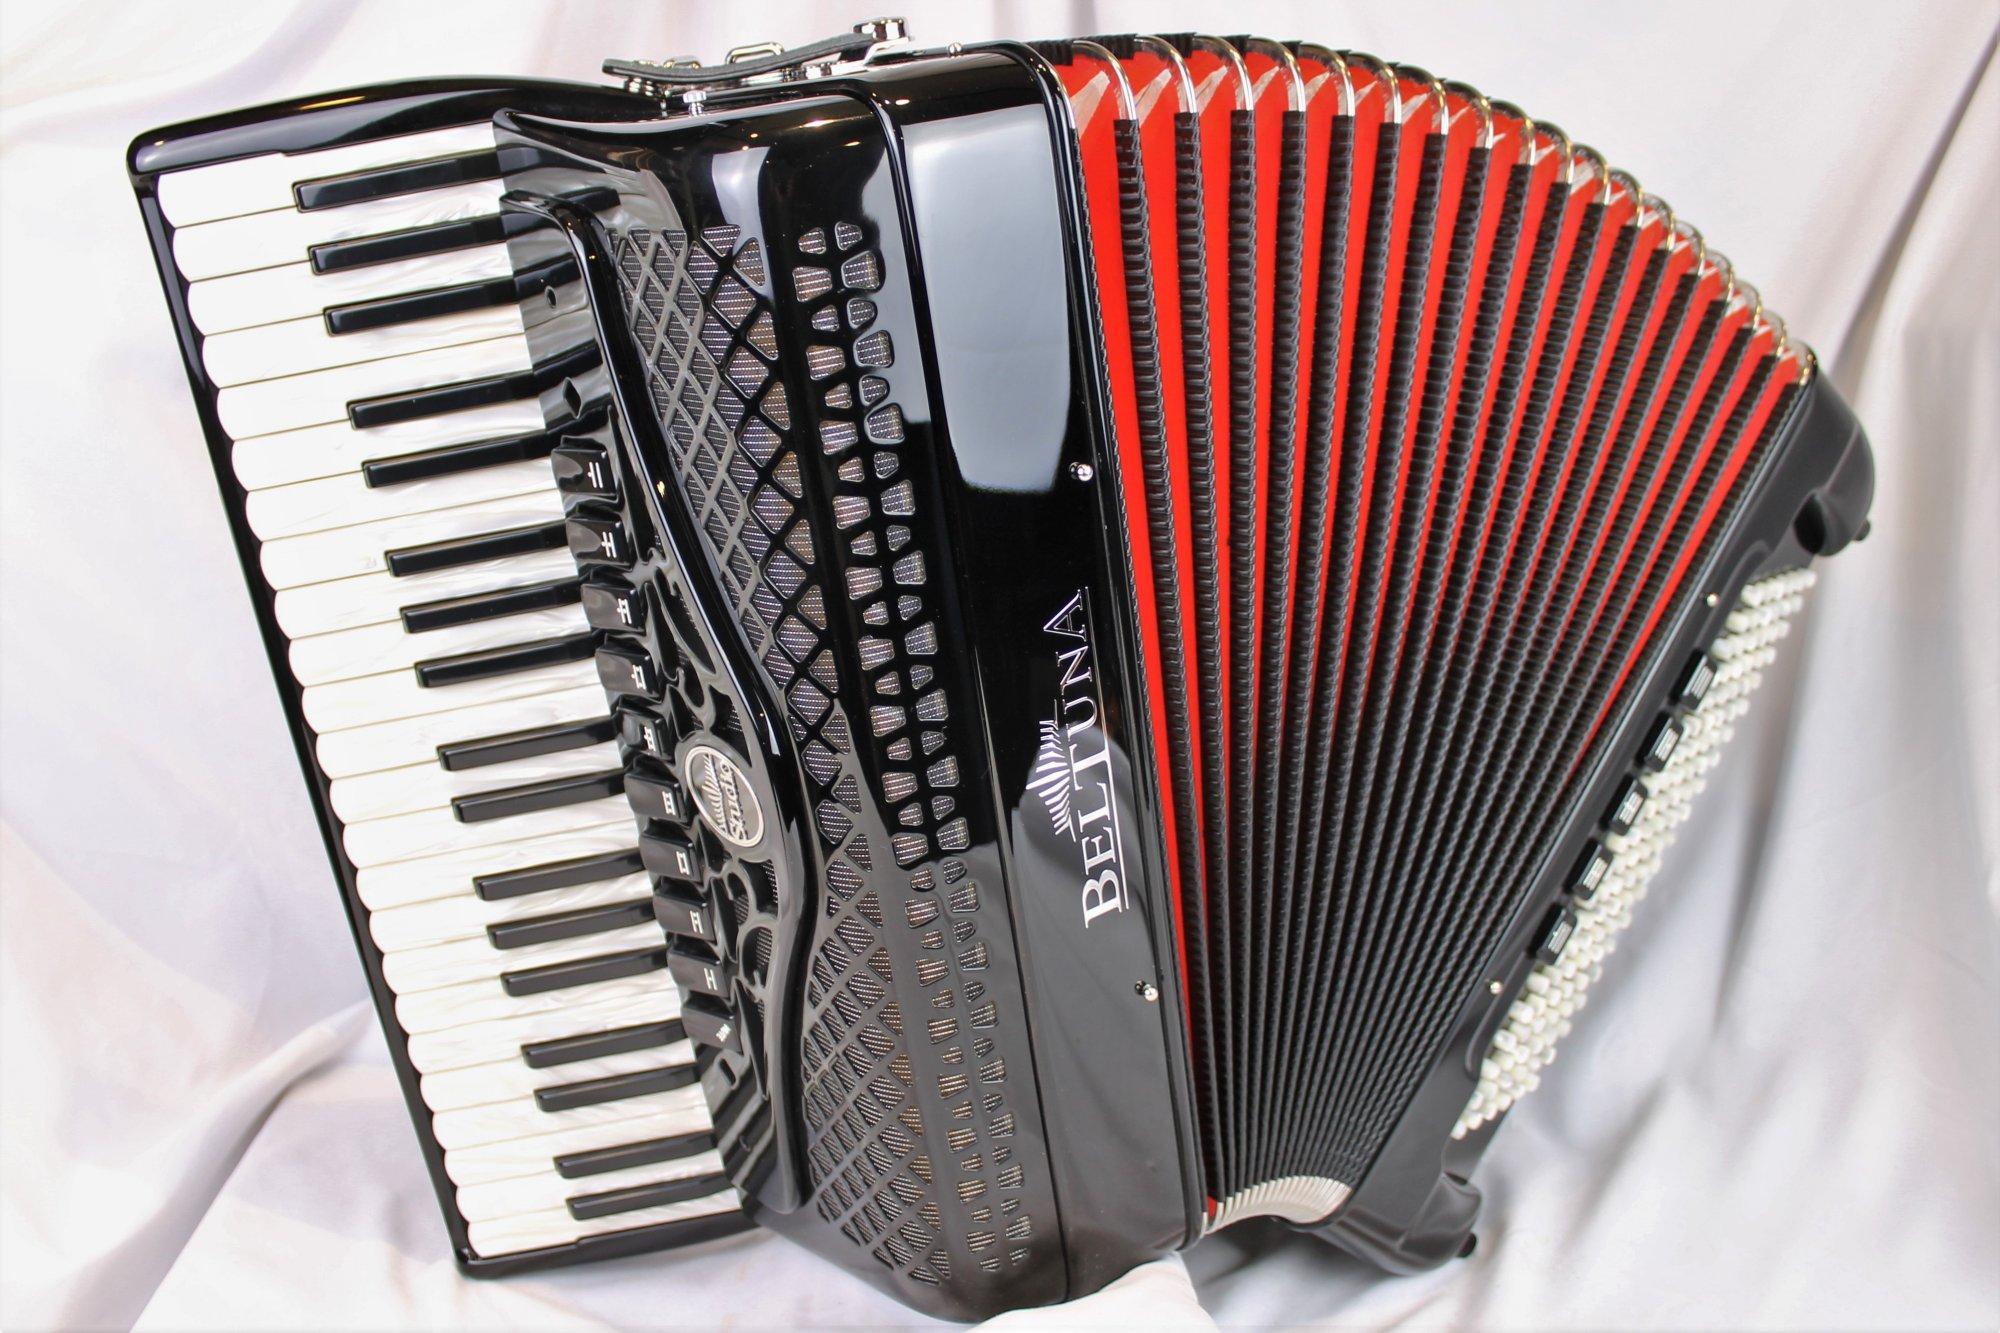 NEW Black Beltuna Studio IV Compact Piano Accordion LMMM 41 120